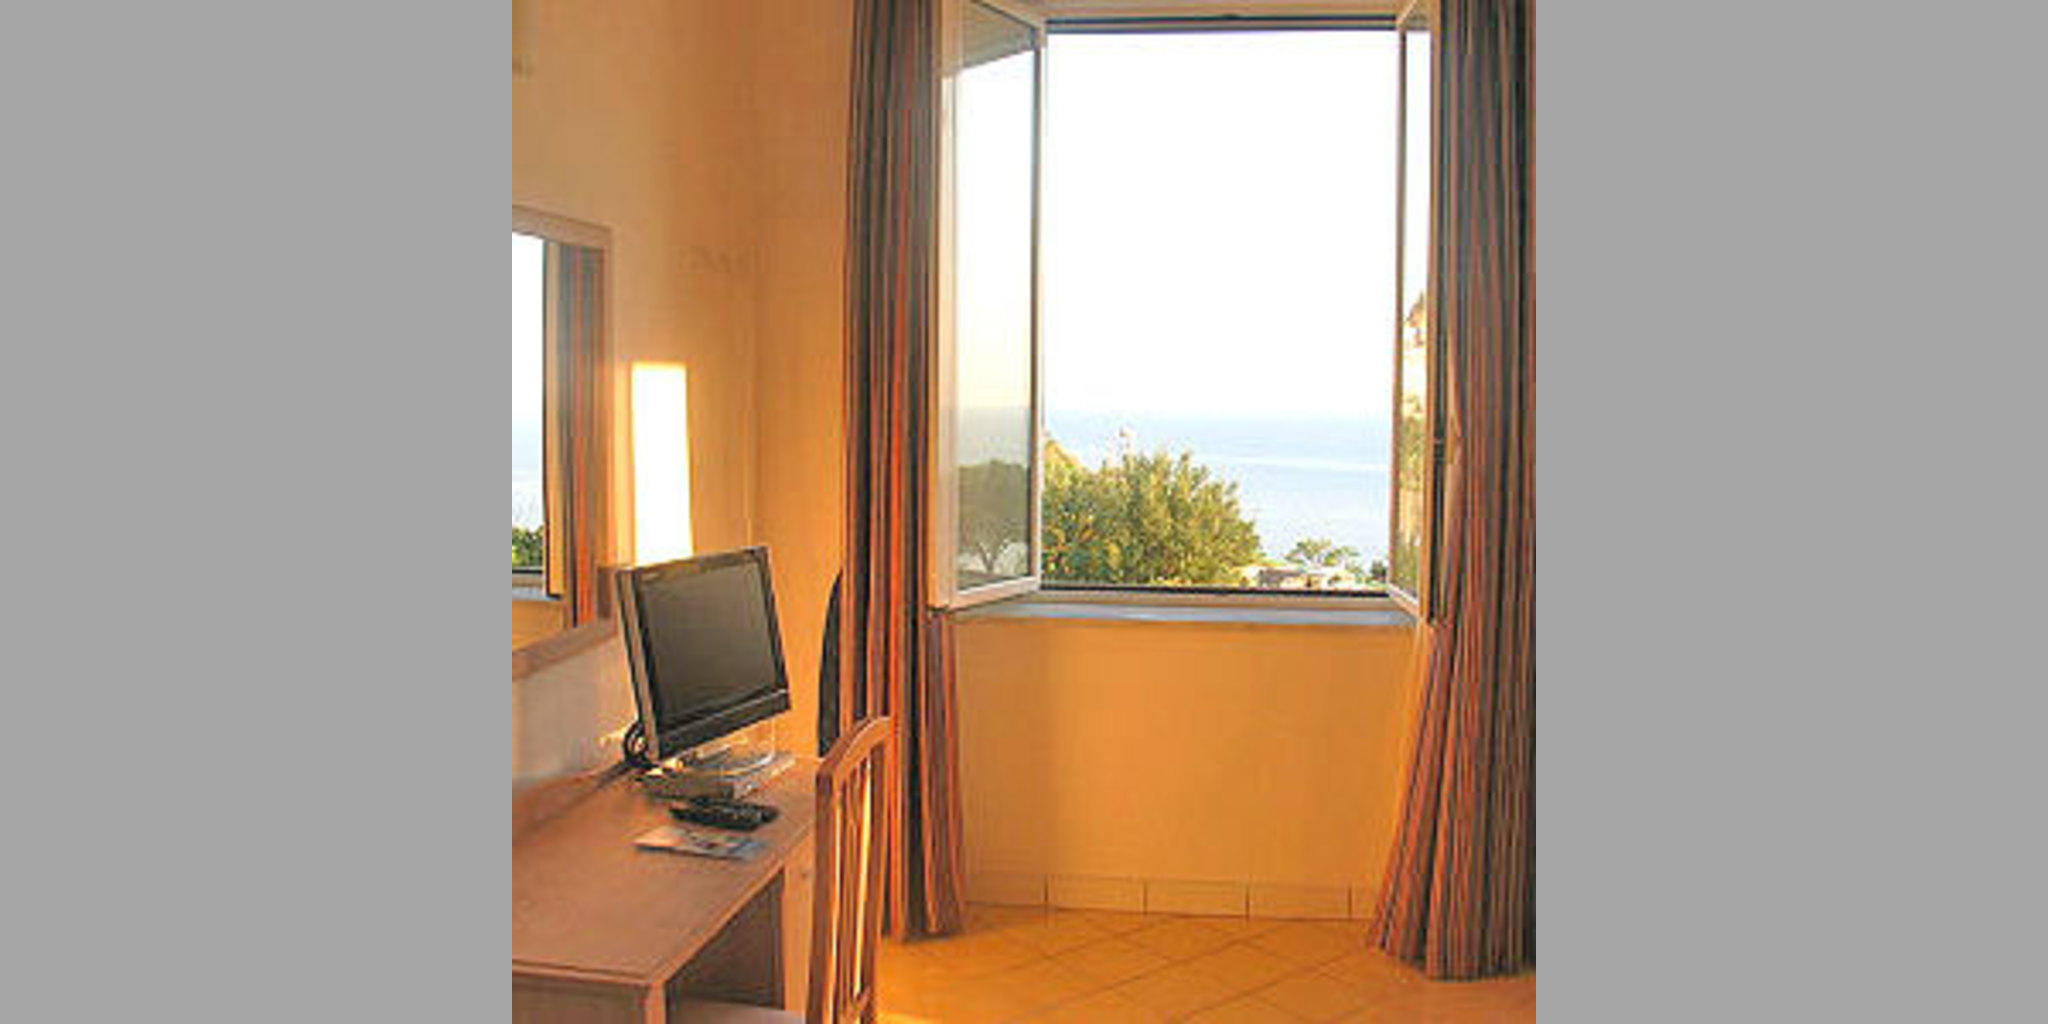 Hotel Barano D'Ischia - Villa Giusto